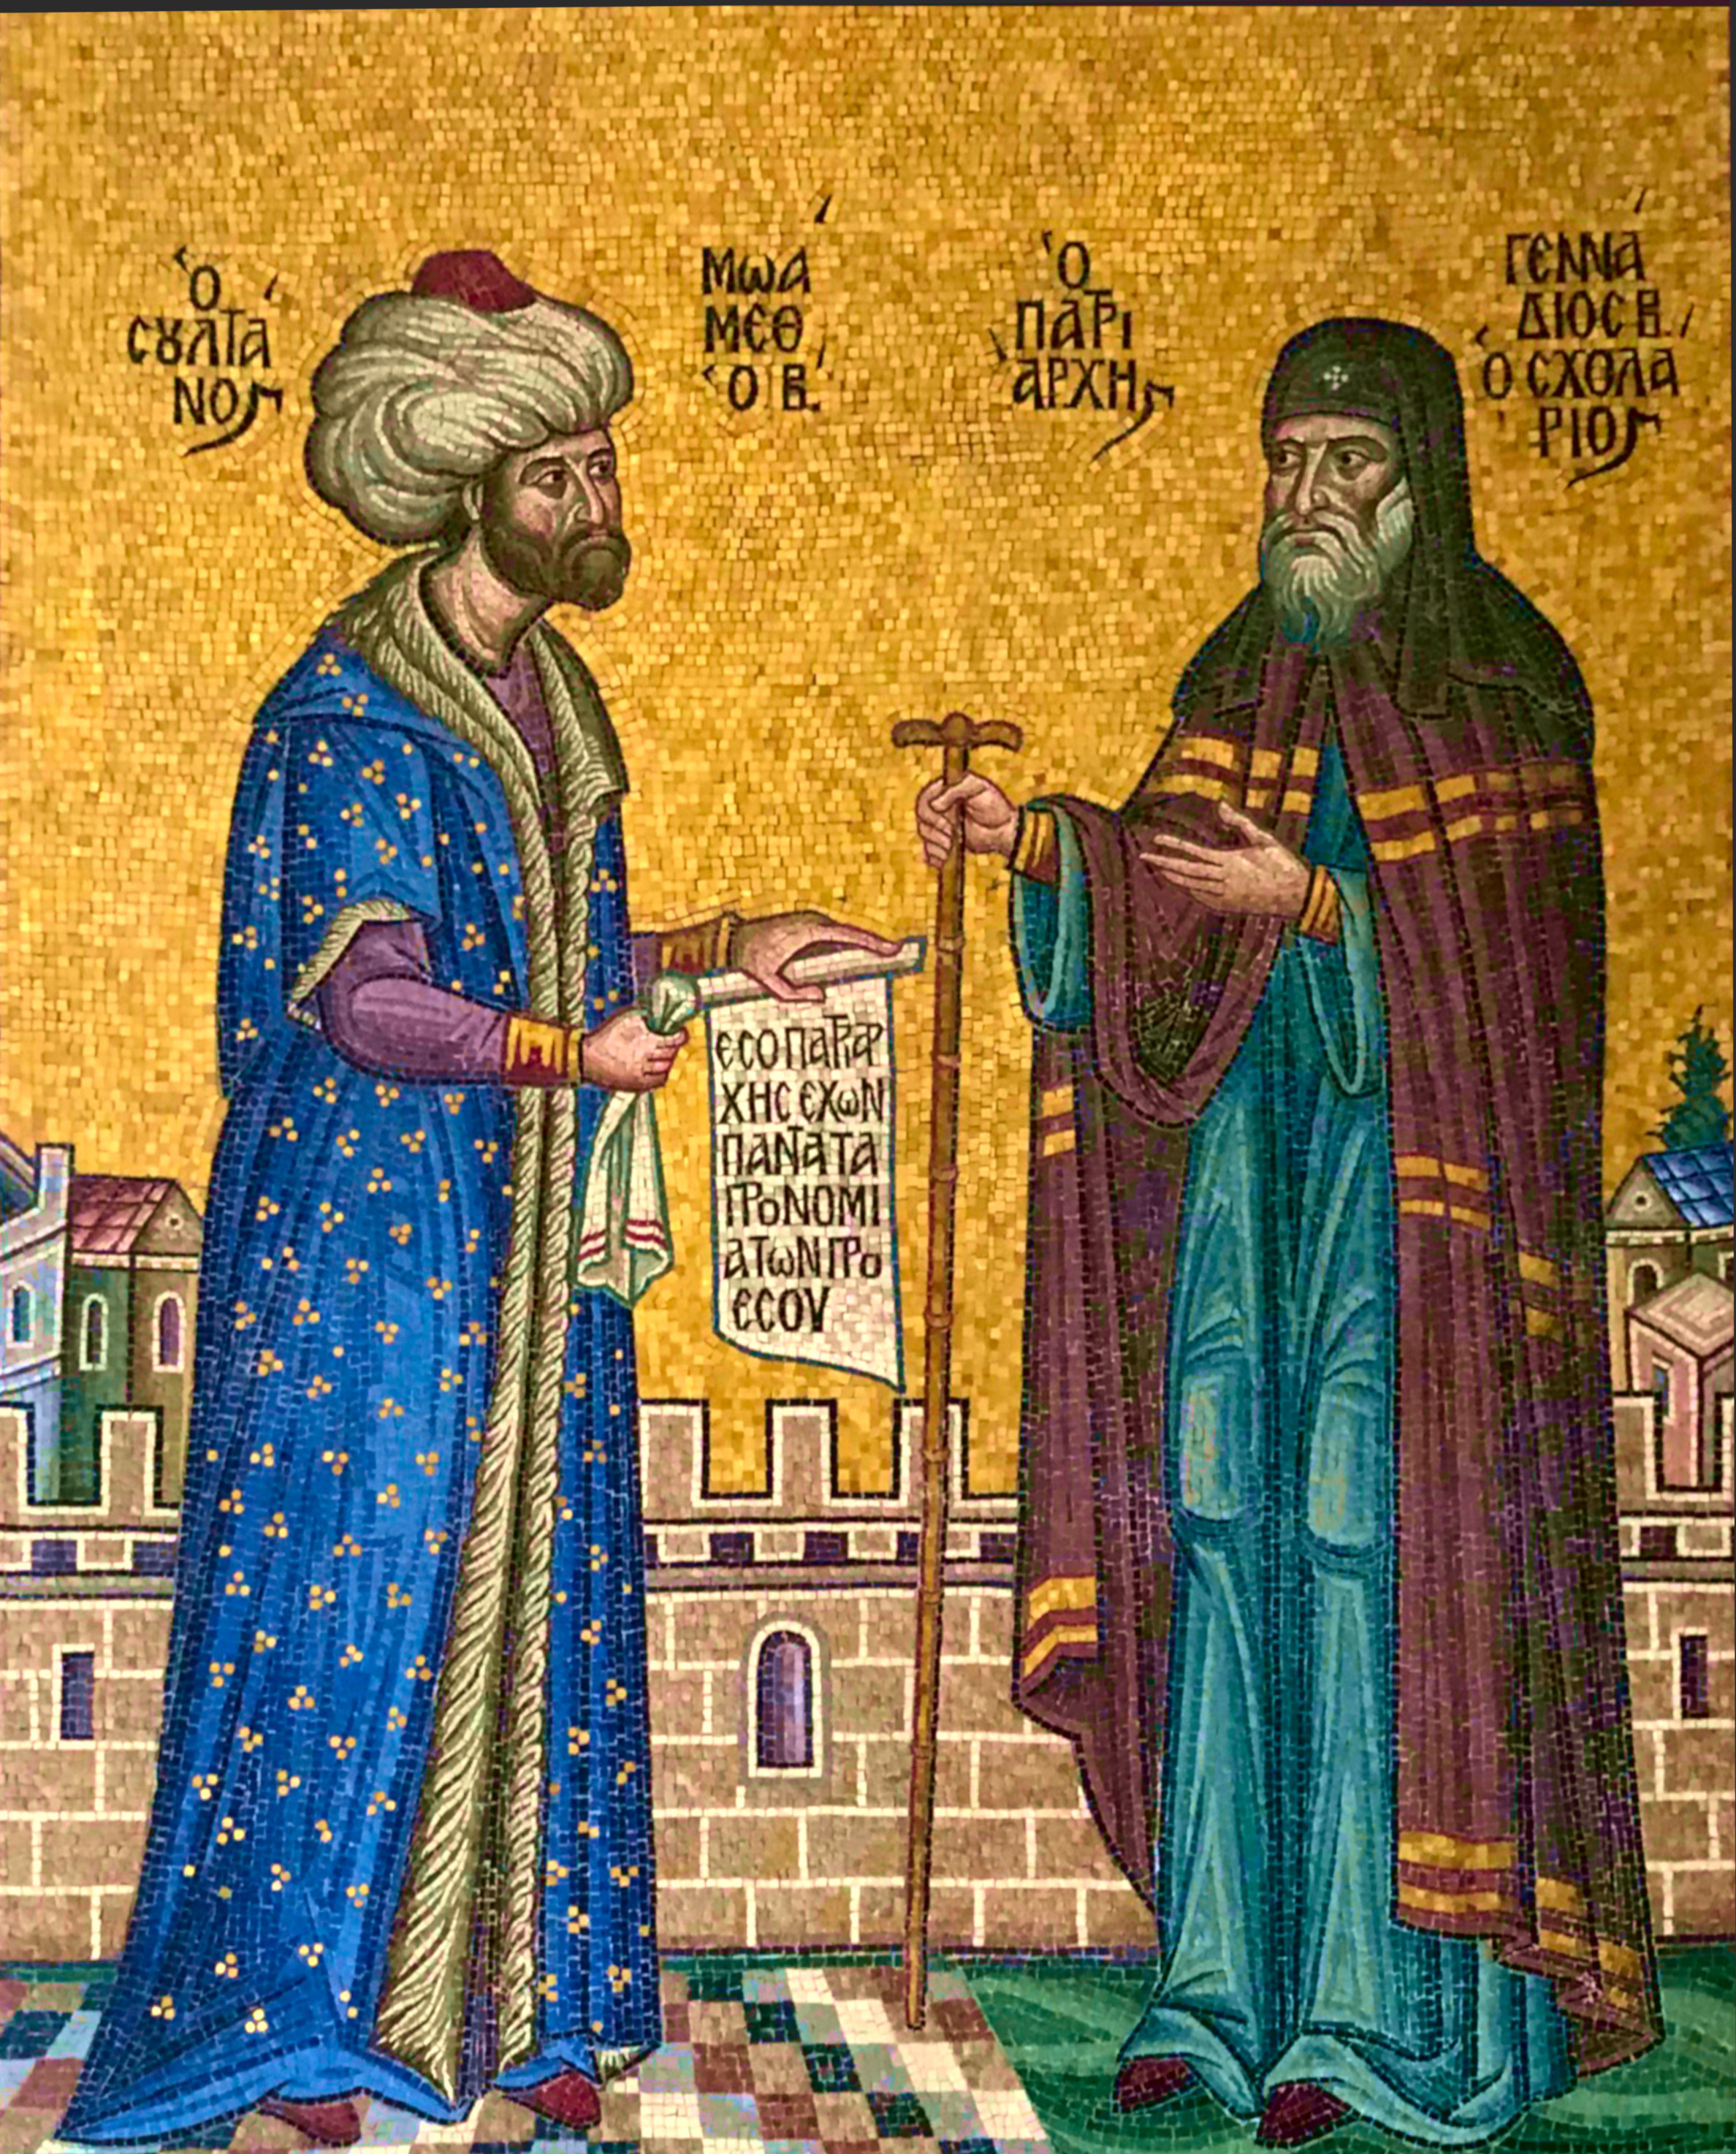 Gennadios II and Mehmed II Η παραχώρηση προνομίων από τον Μωάμεθ Β στον Πατριάρχη Γεννάδιο Σχολάριο (1454)